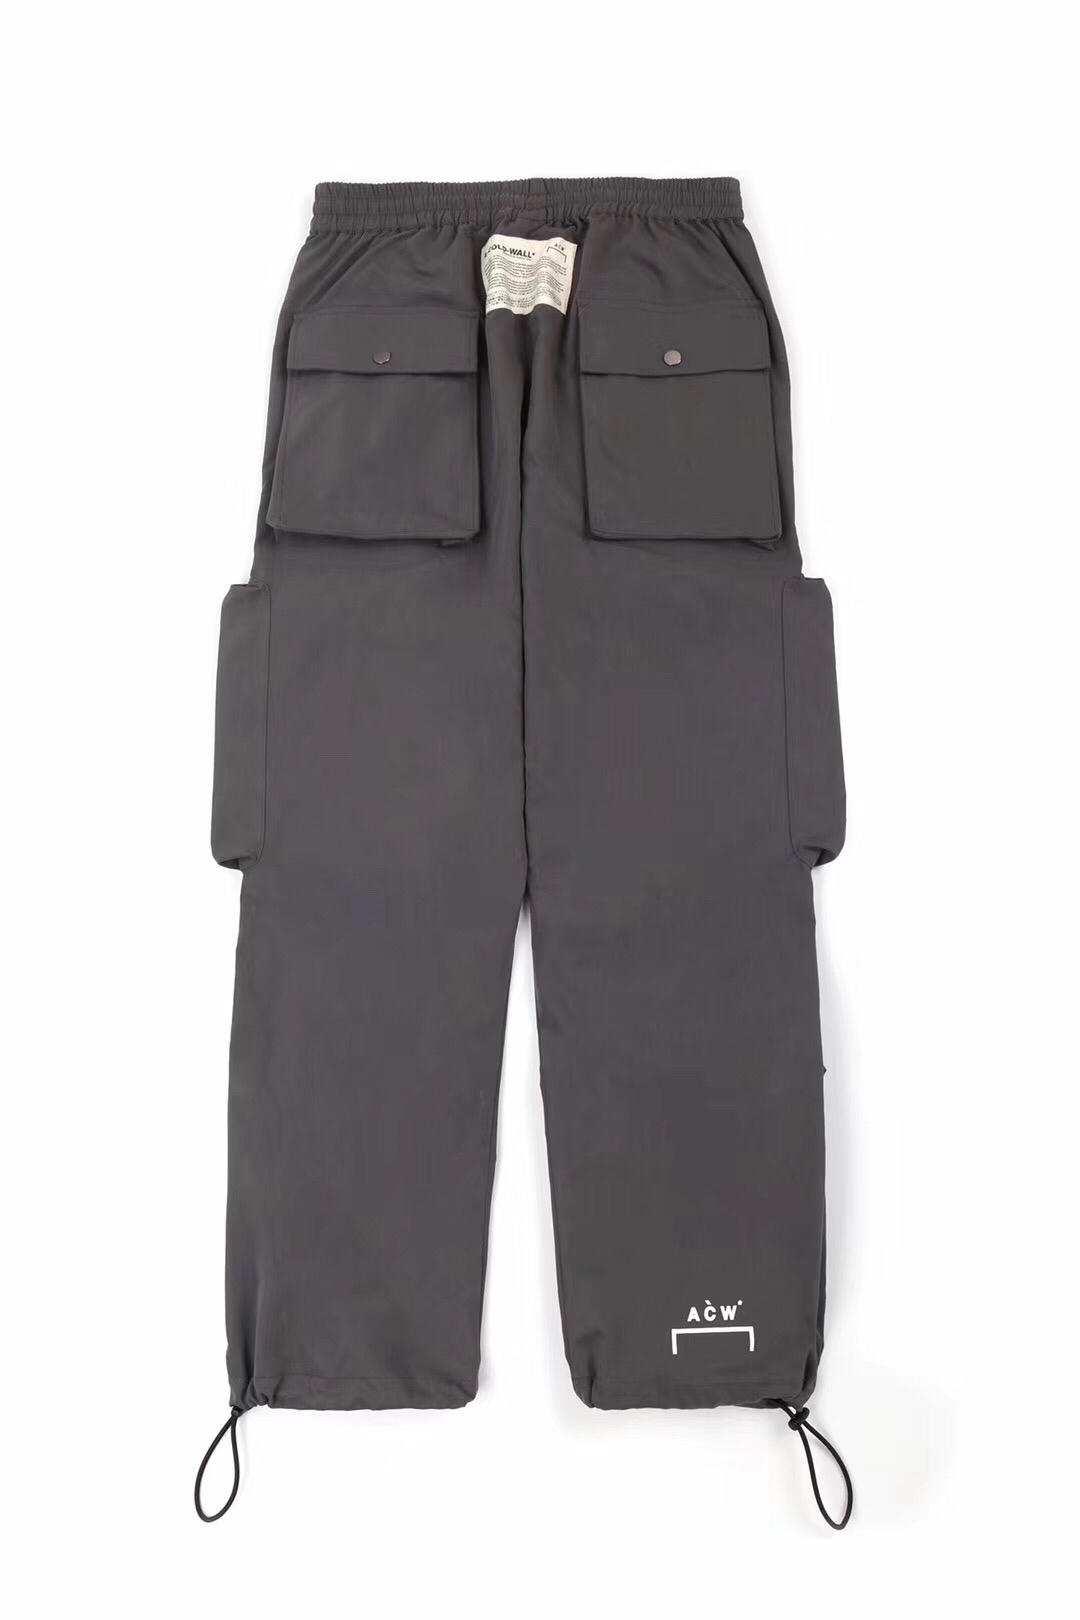 19ss Acw Cargo pantalon poche A froid mur pantalon Hip Hop Streetwear Acw cordon Streetwear kanye west Joggers pantalon A-COLD-WALL